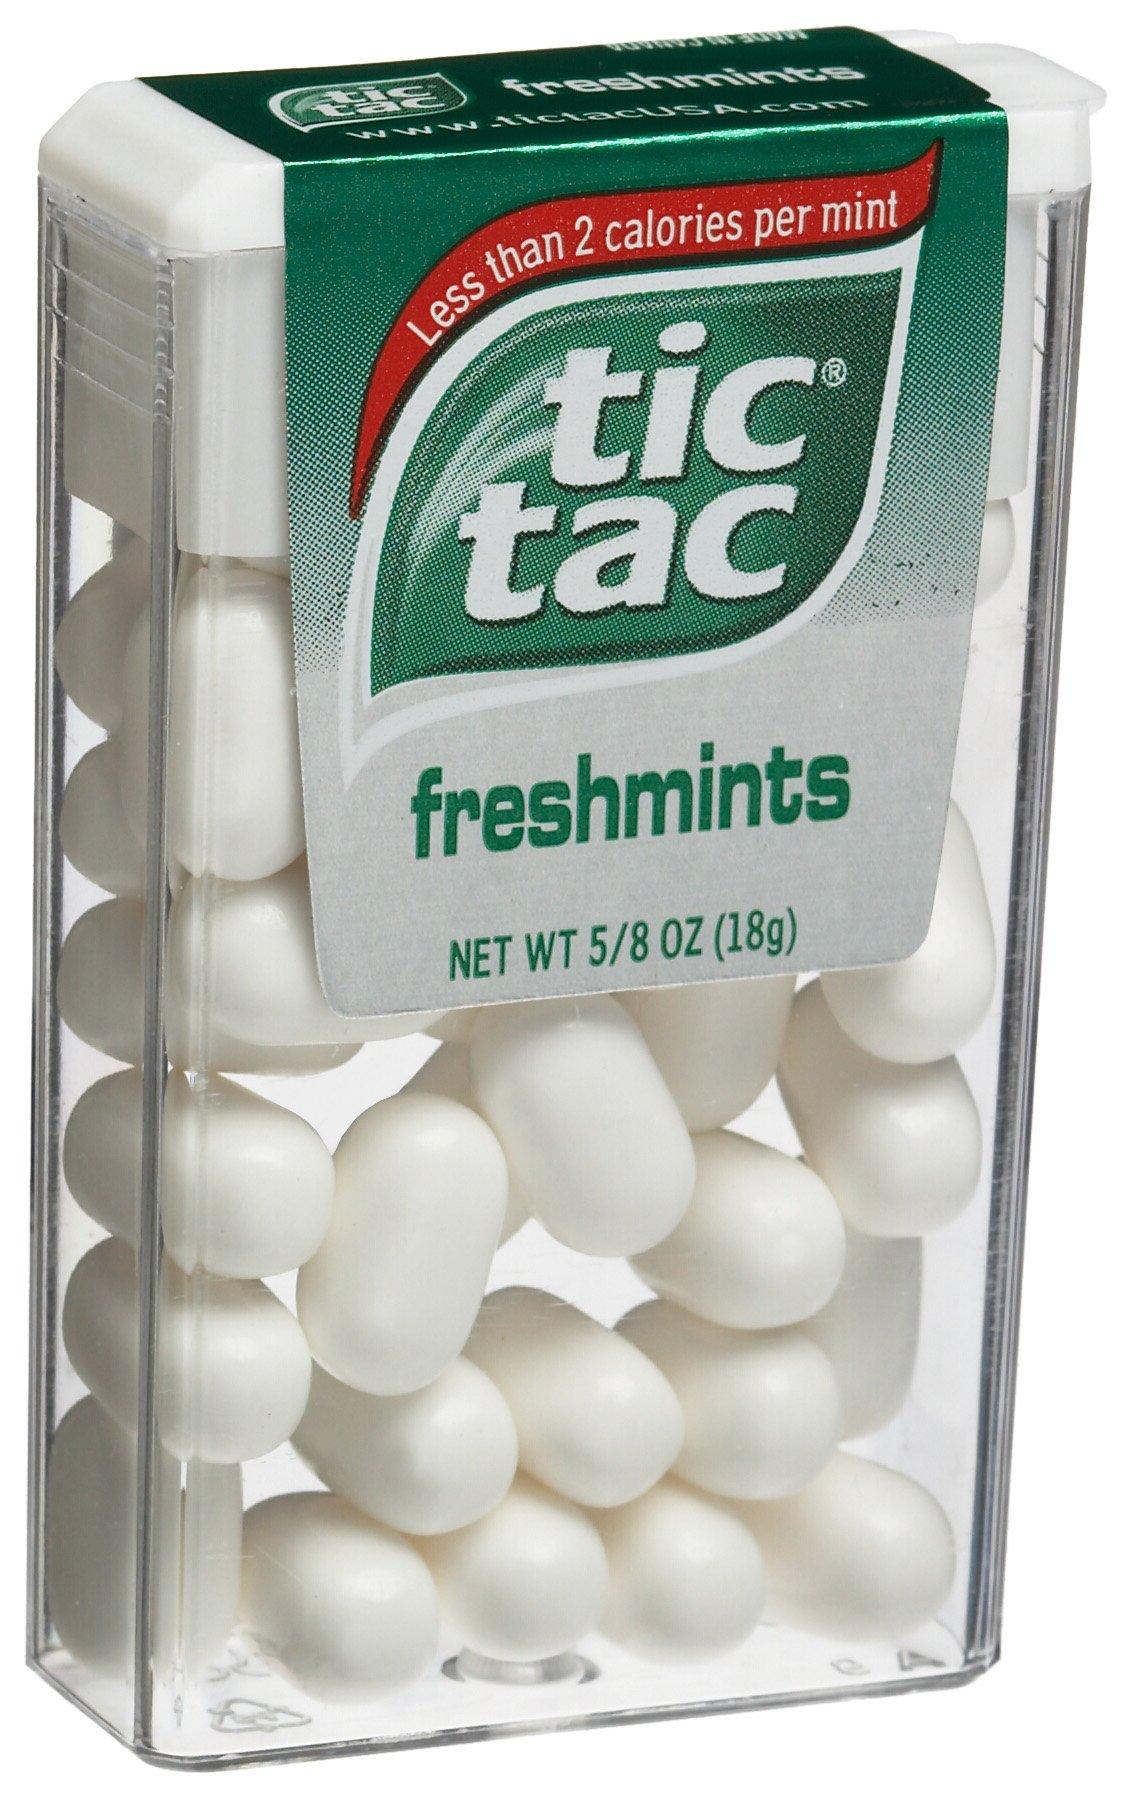 Tic Tac Freshmint Mints, 0.625-Ounce-Dispensers (Pack of 48)